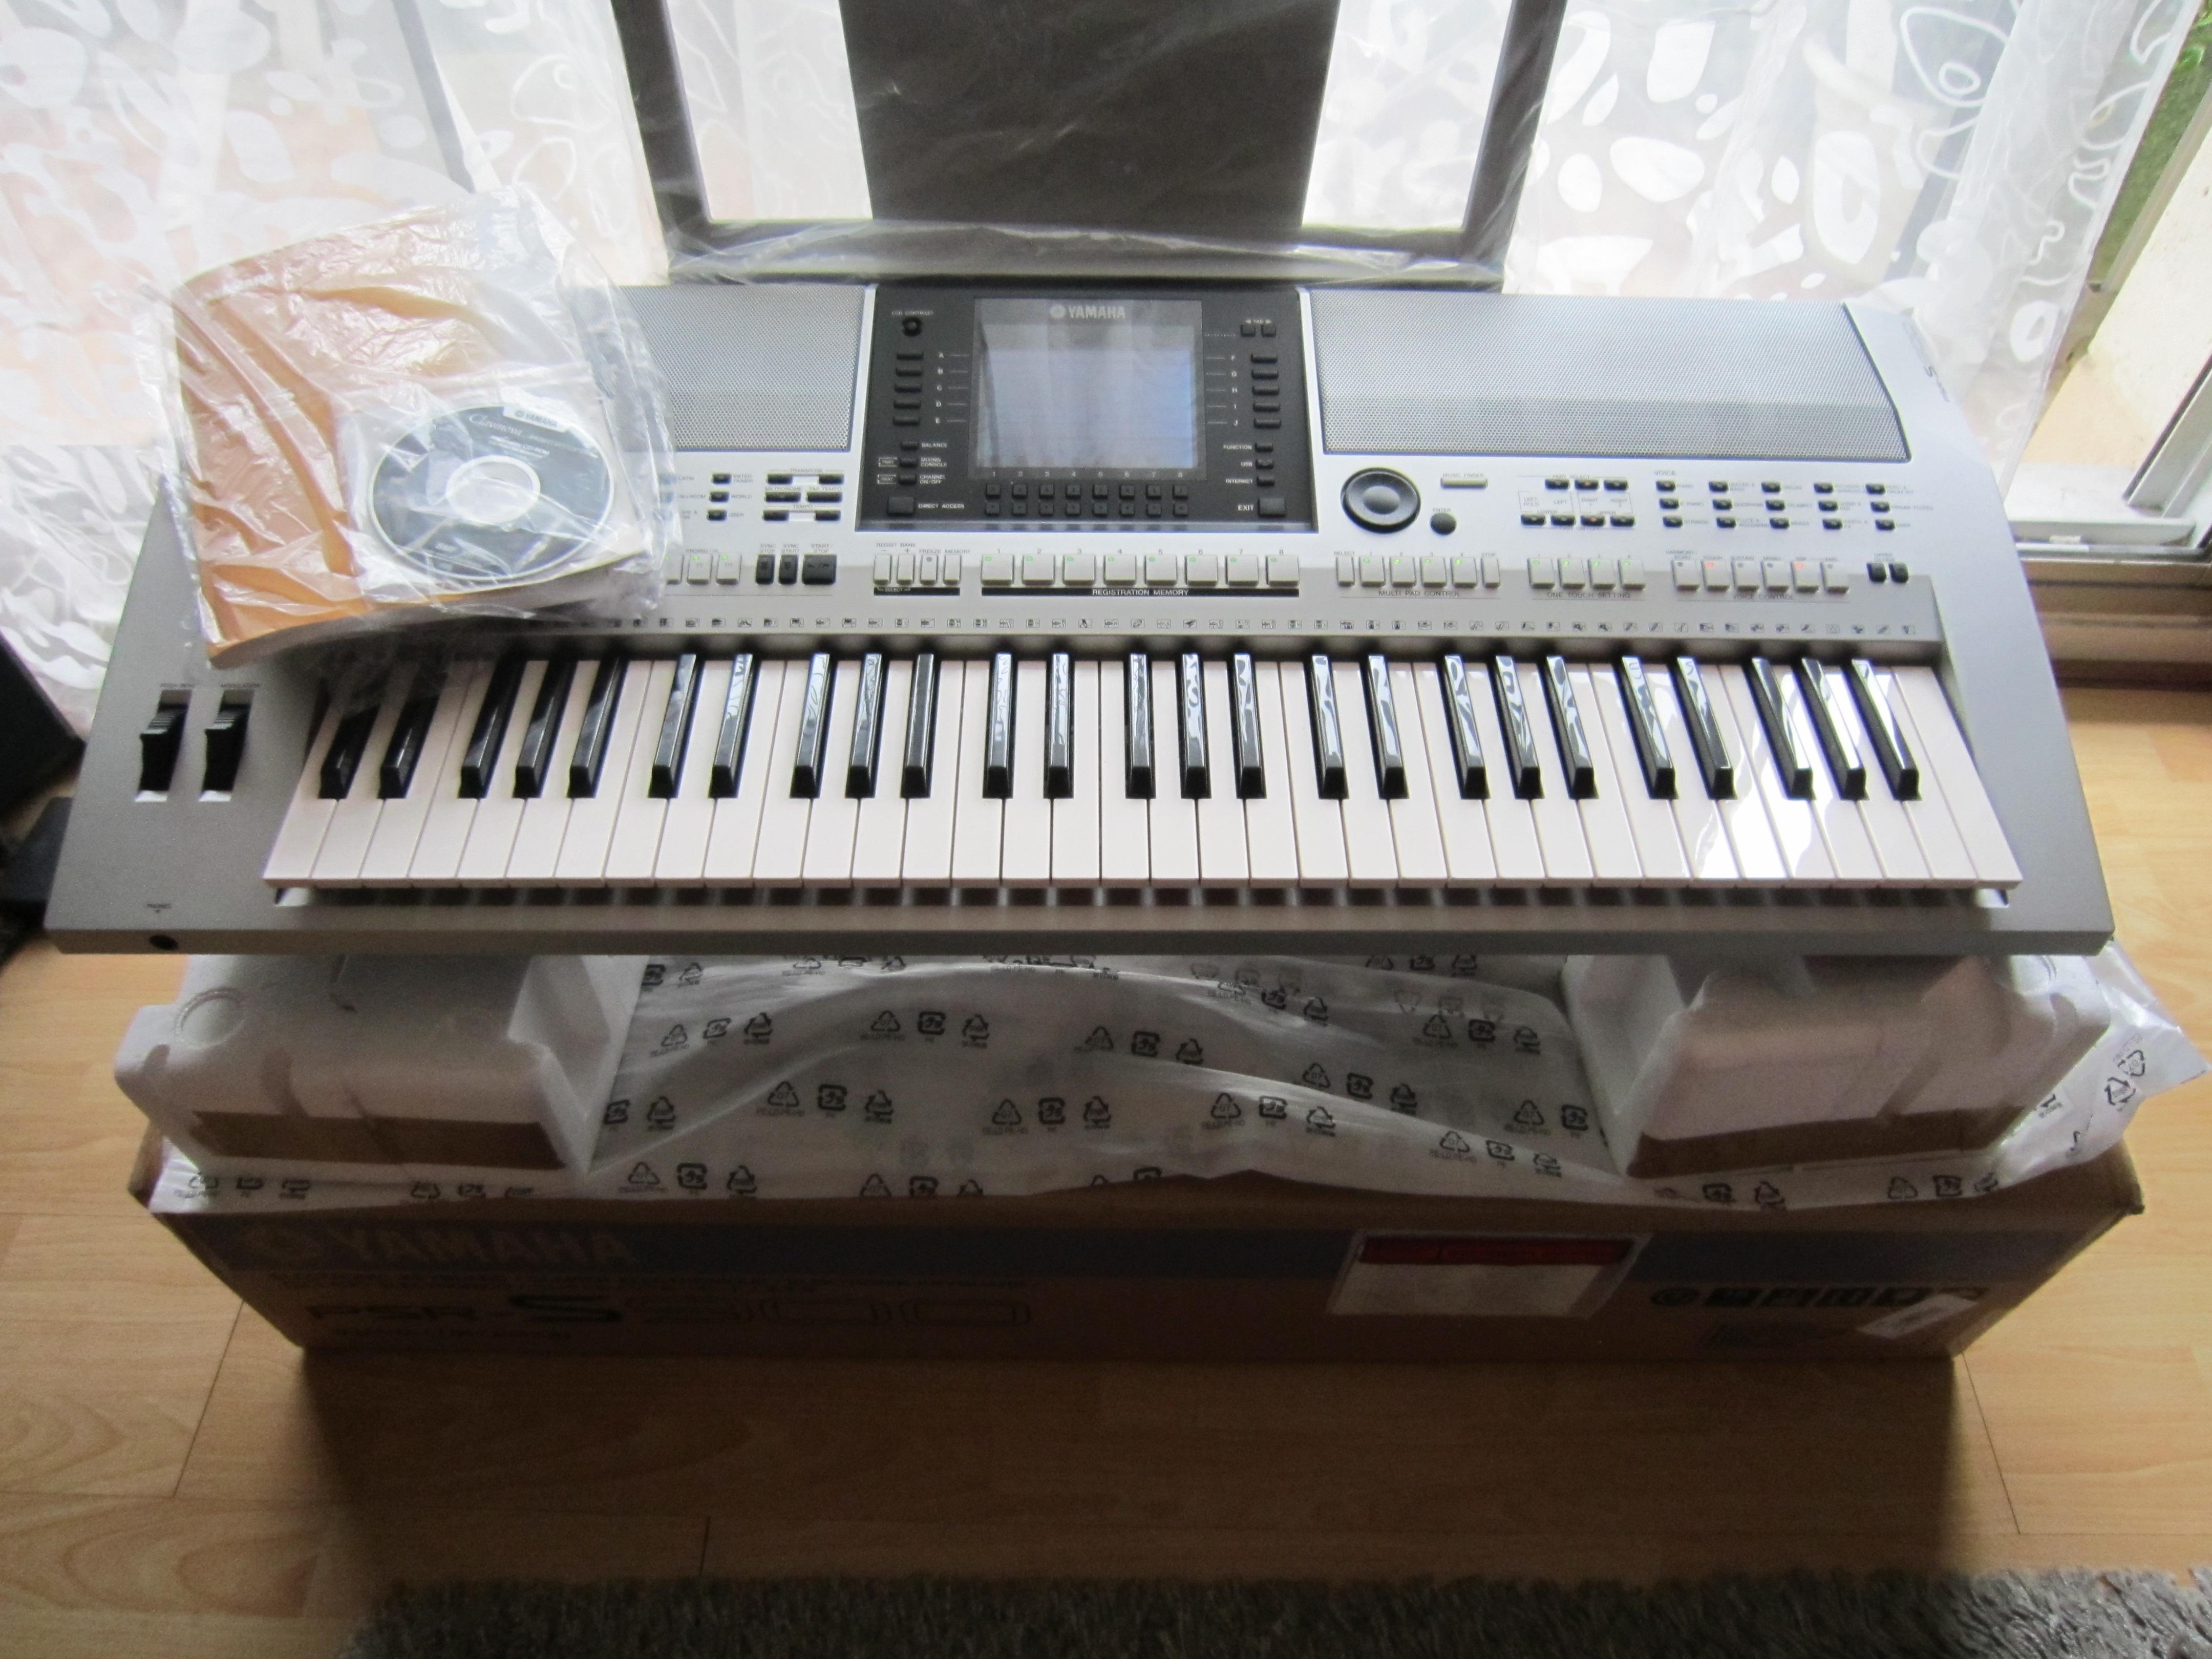 Yamaha psr s900 image 613427 audiofanzine for Psr s900 yamaha